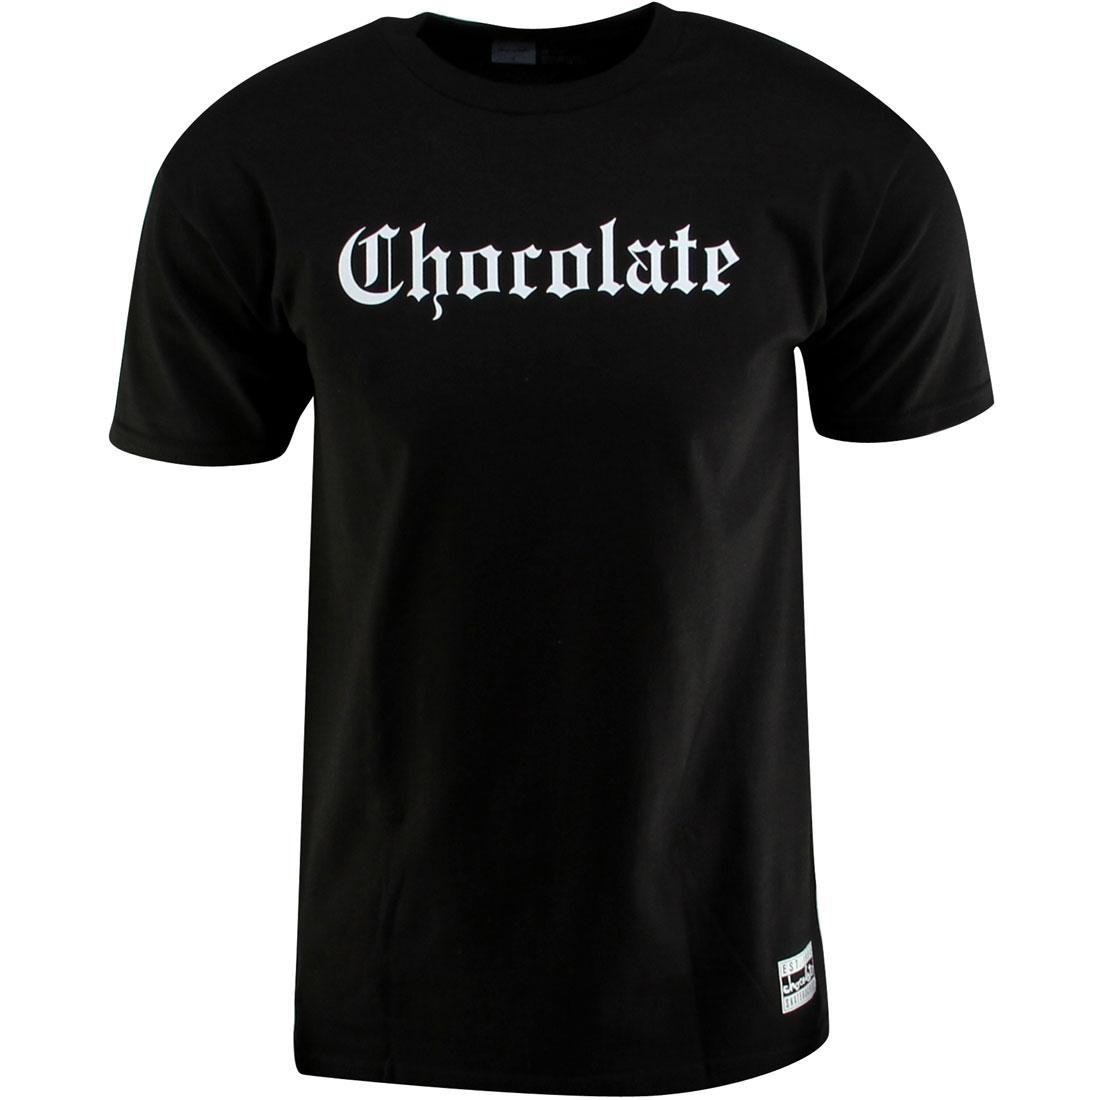 Tシャツ 黒 ブラック 【 BLACK GIRL SKATEBOARD CHOCOLATE EAZY C TEE 】 メンズファッション トップス Tシャツ カットソー